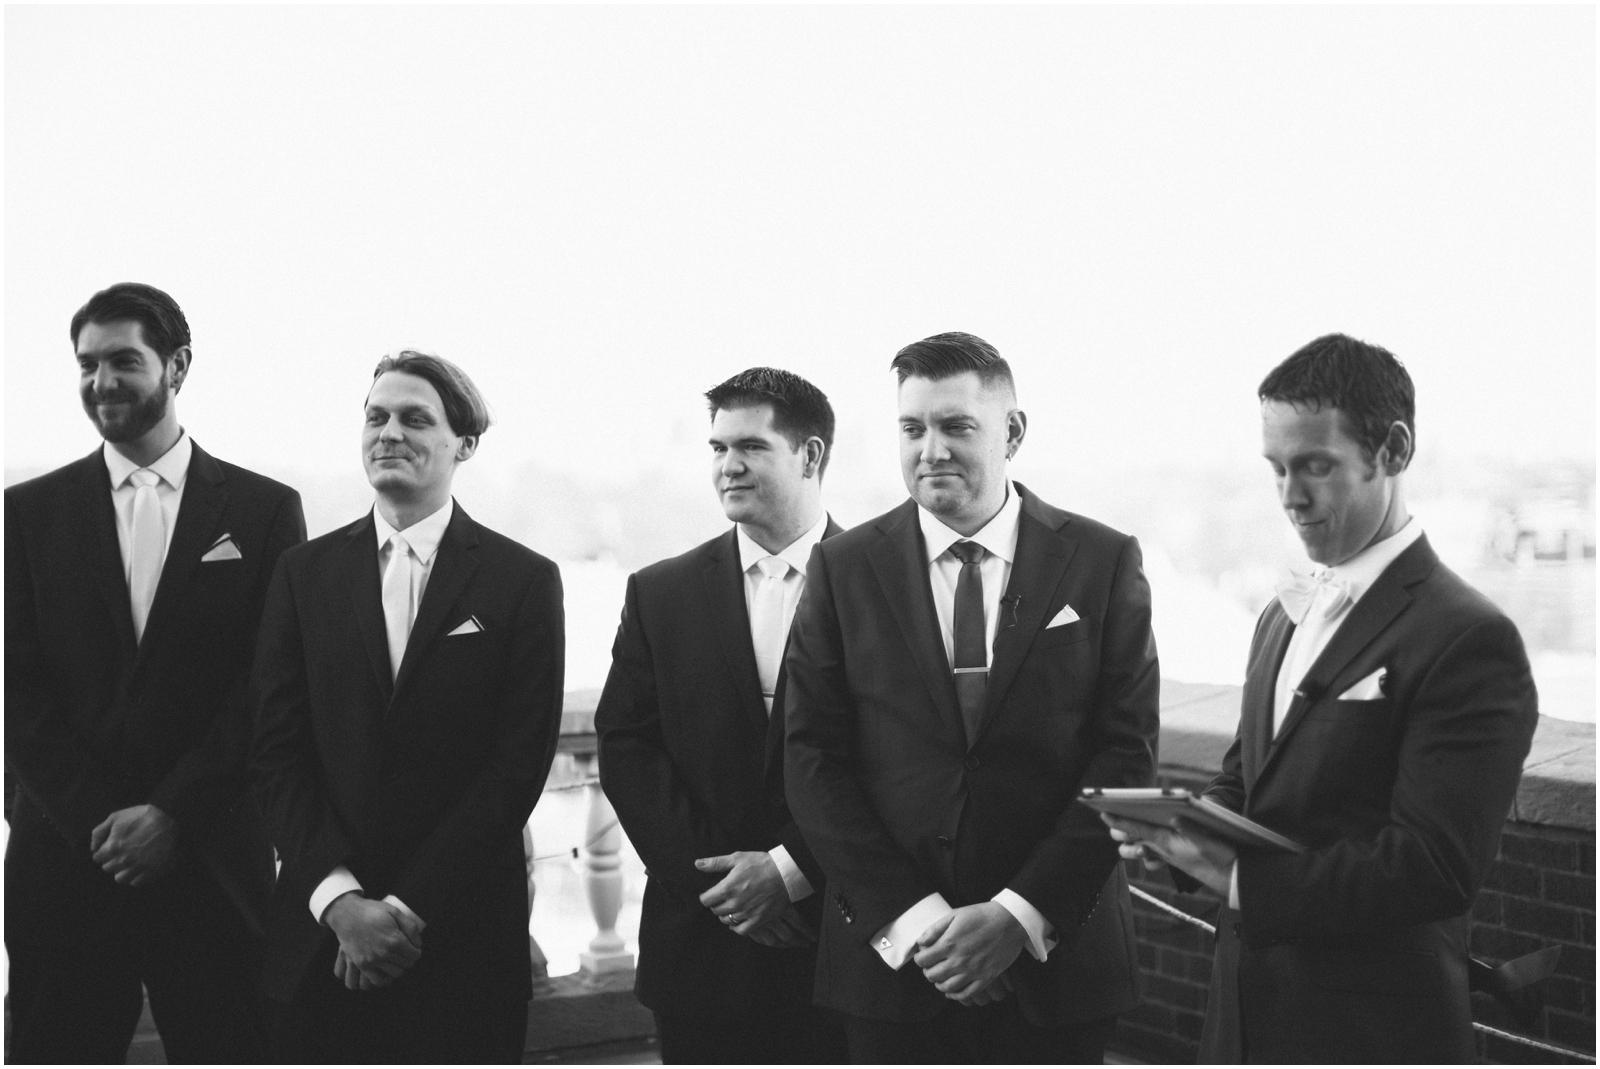 chicago_wedding_photographer-60.jpg